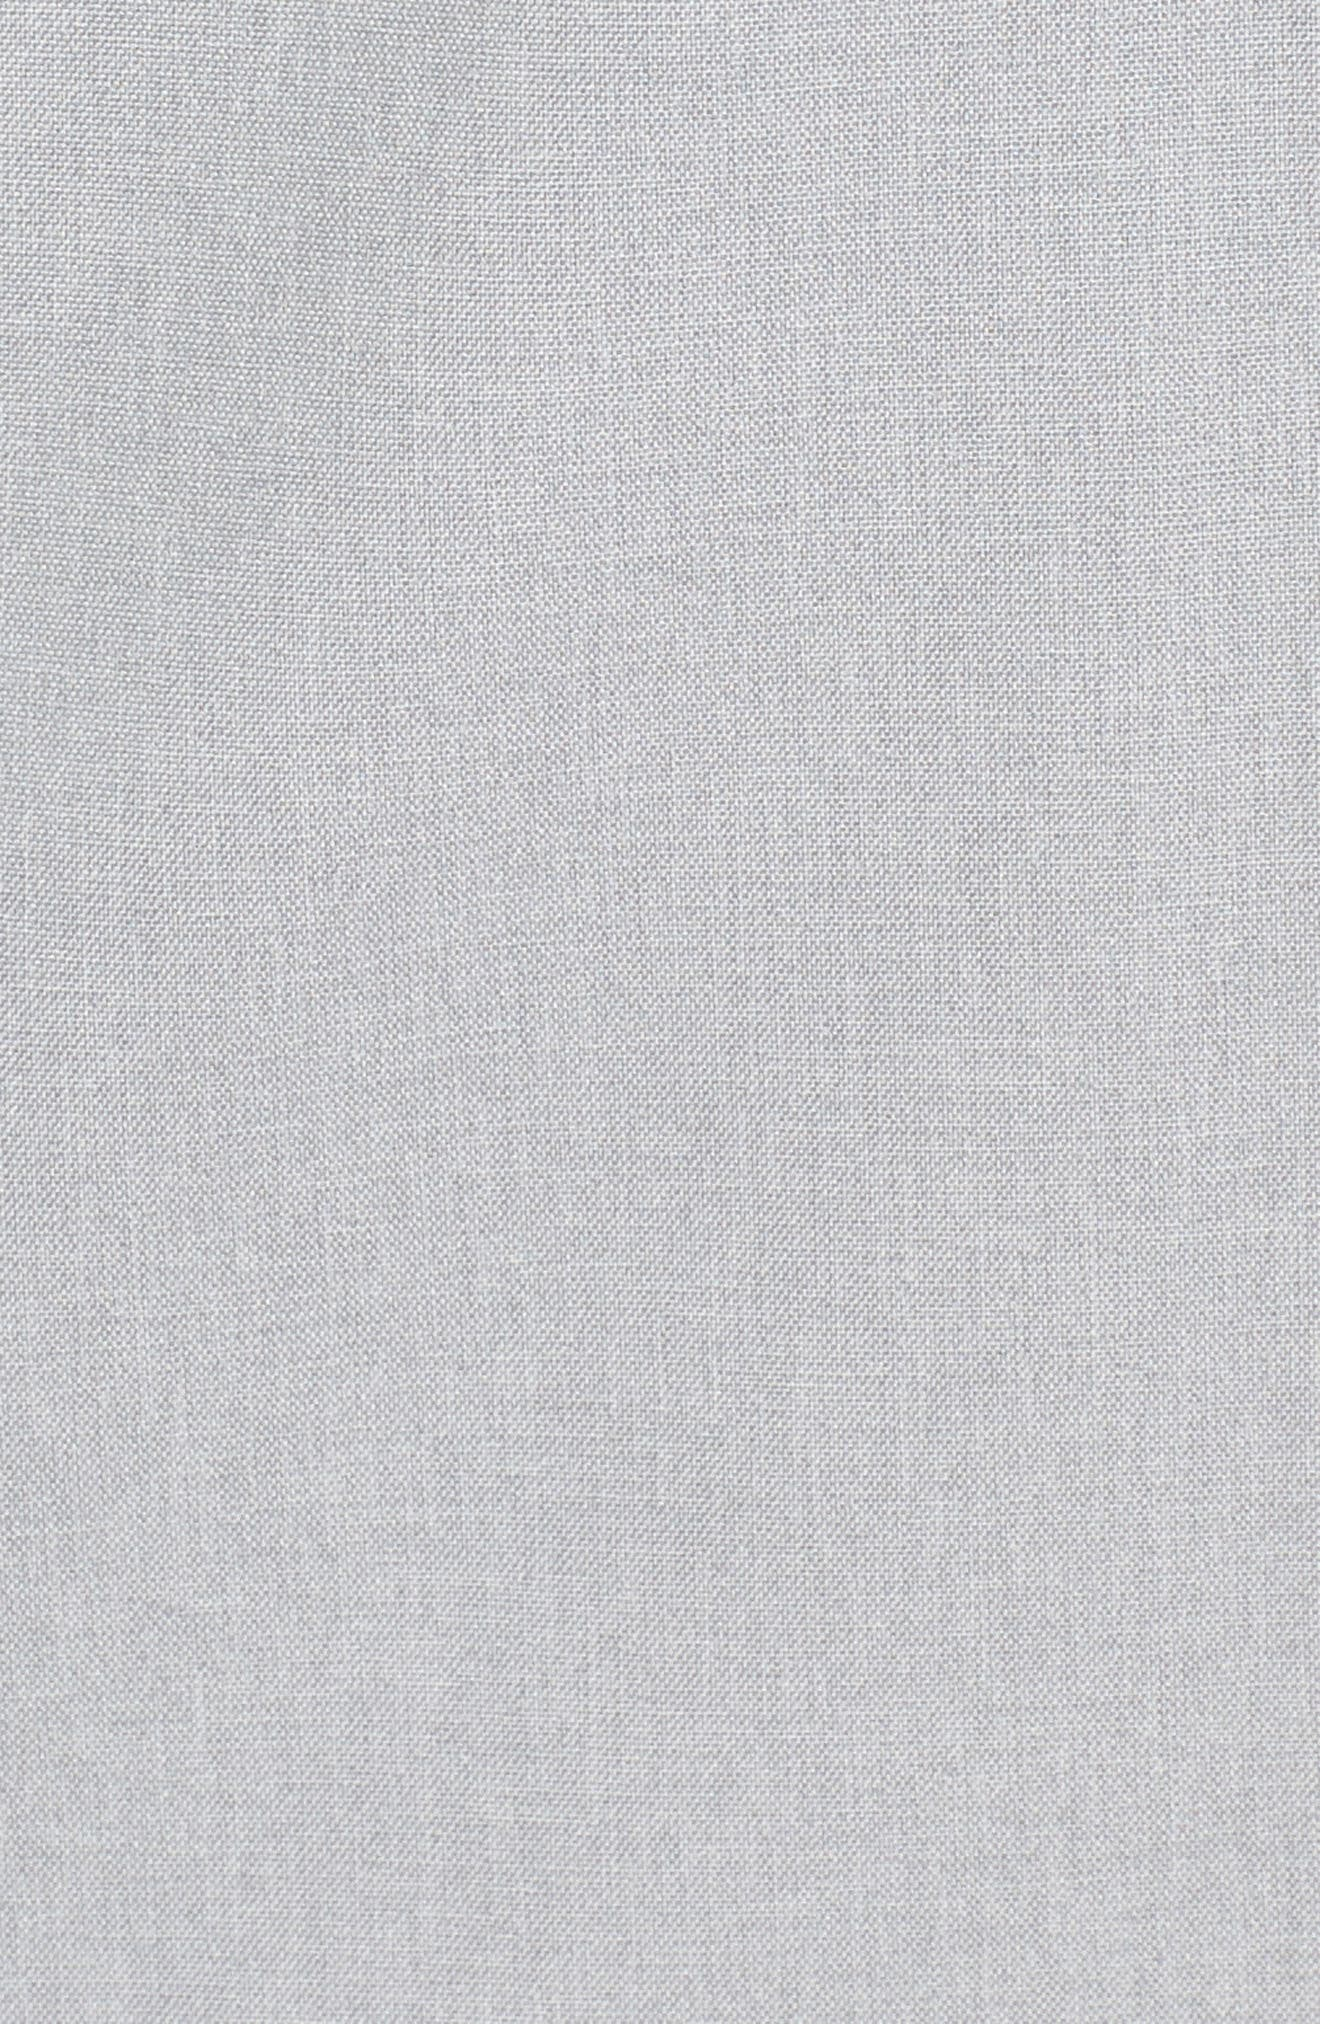 'Kilowatt' Hooded Jacket,                             Alternate thumbnail 5, color,                             Tnf Light Grey Heather